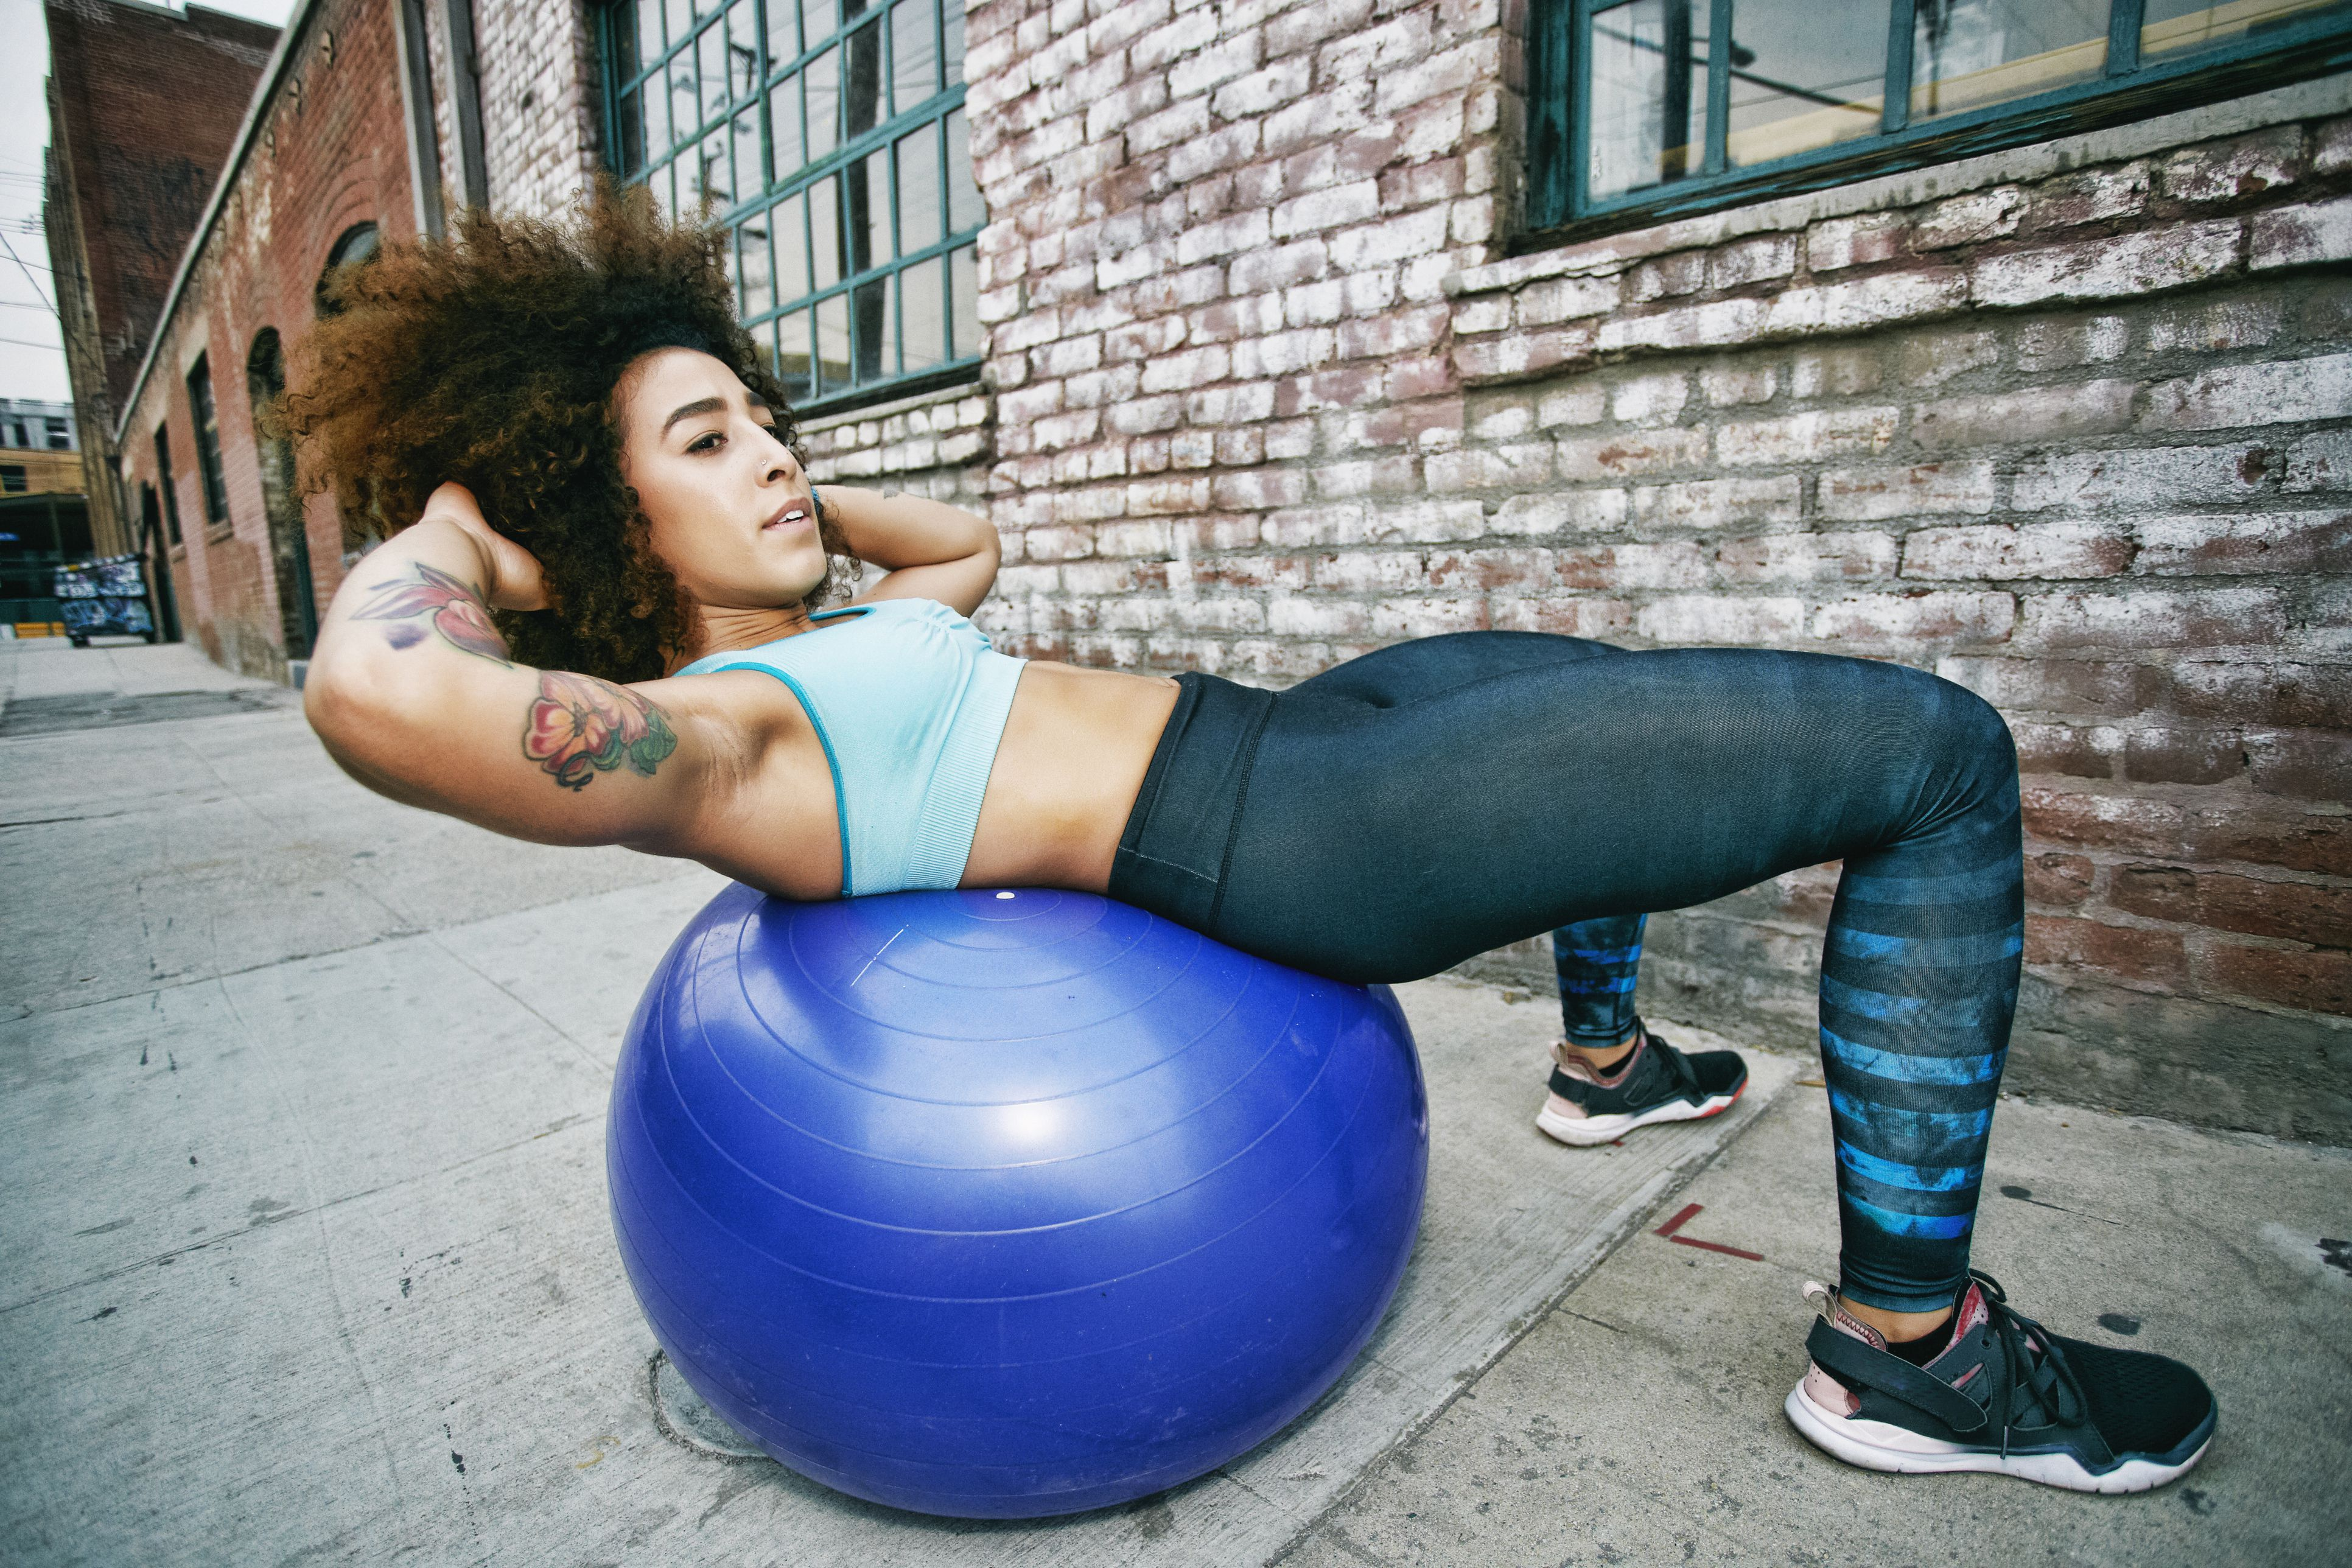 Mujer hispana de equilibrio sobre la pelota de fitness cerca de la pared de ladrillo